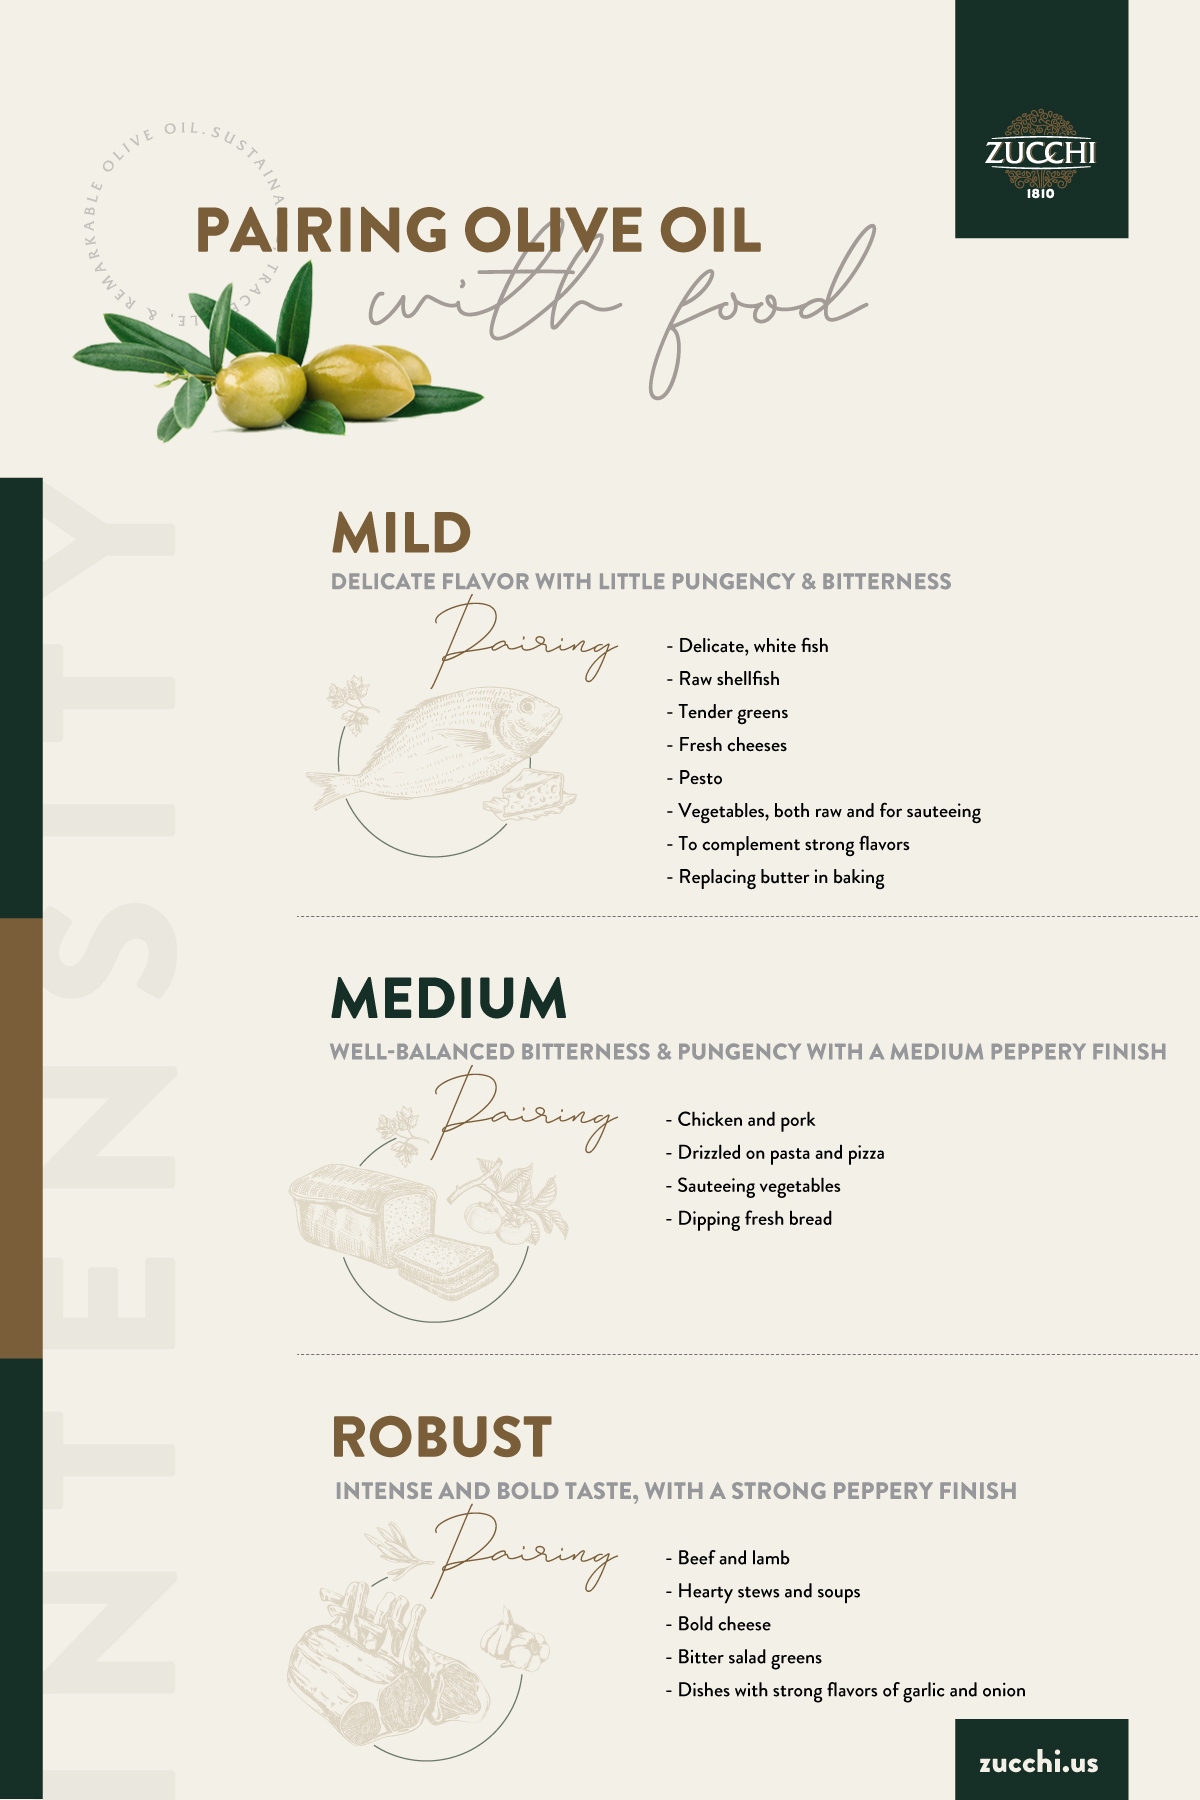 Olive Oil Pairing Chart - Zucchi 1810